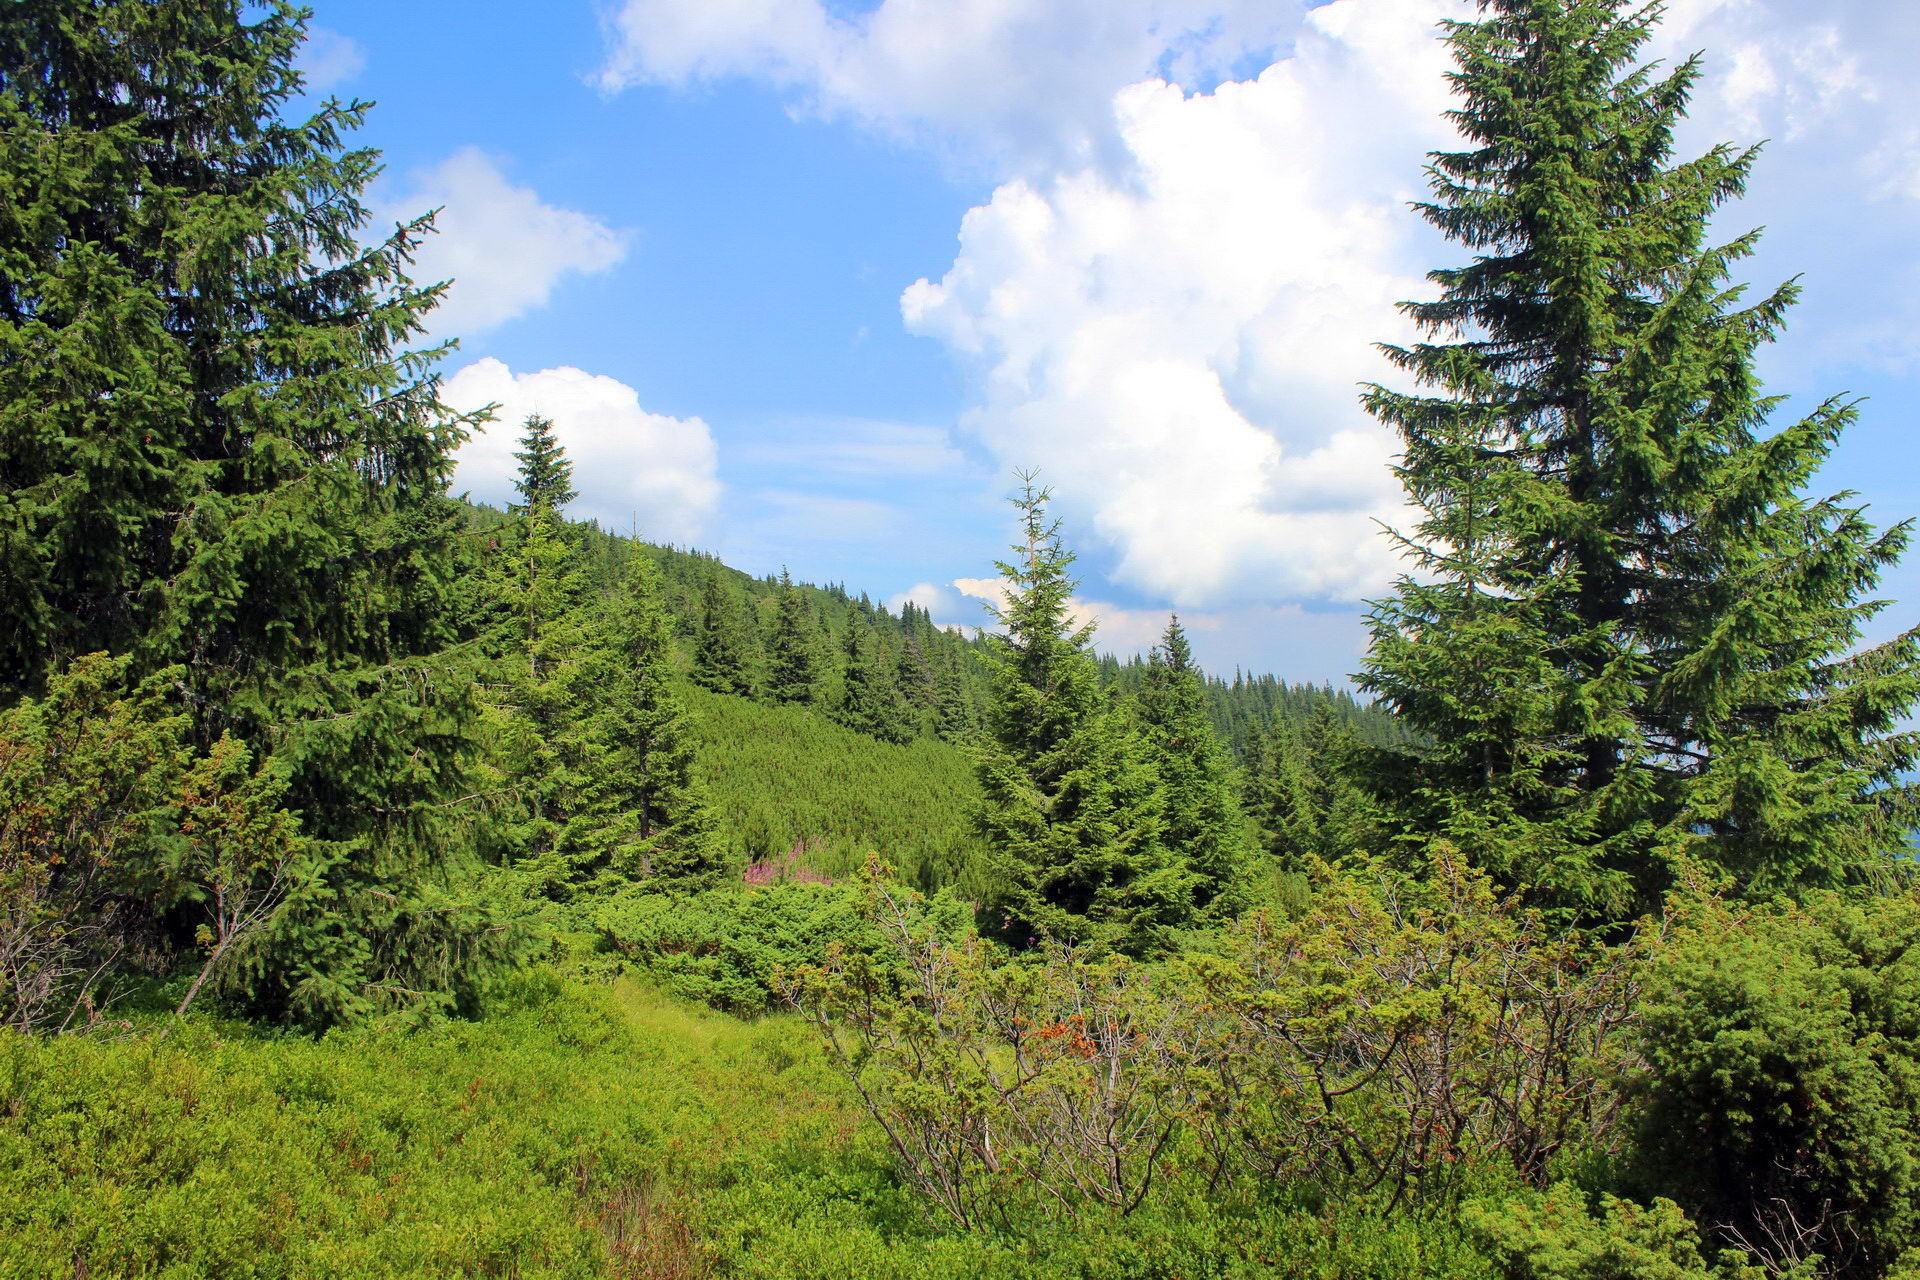 Туристический маршрут на гору Шпицы из Заросляка